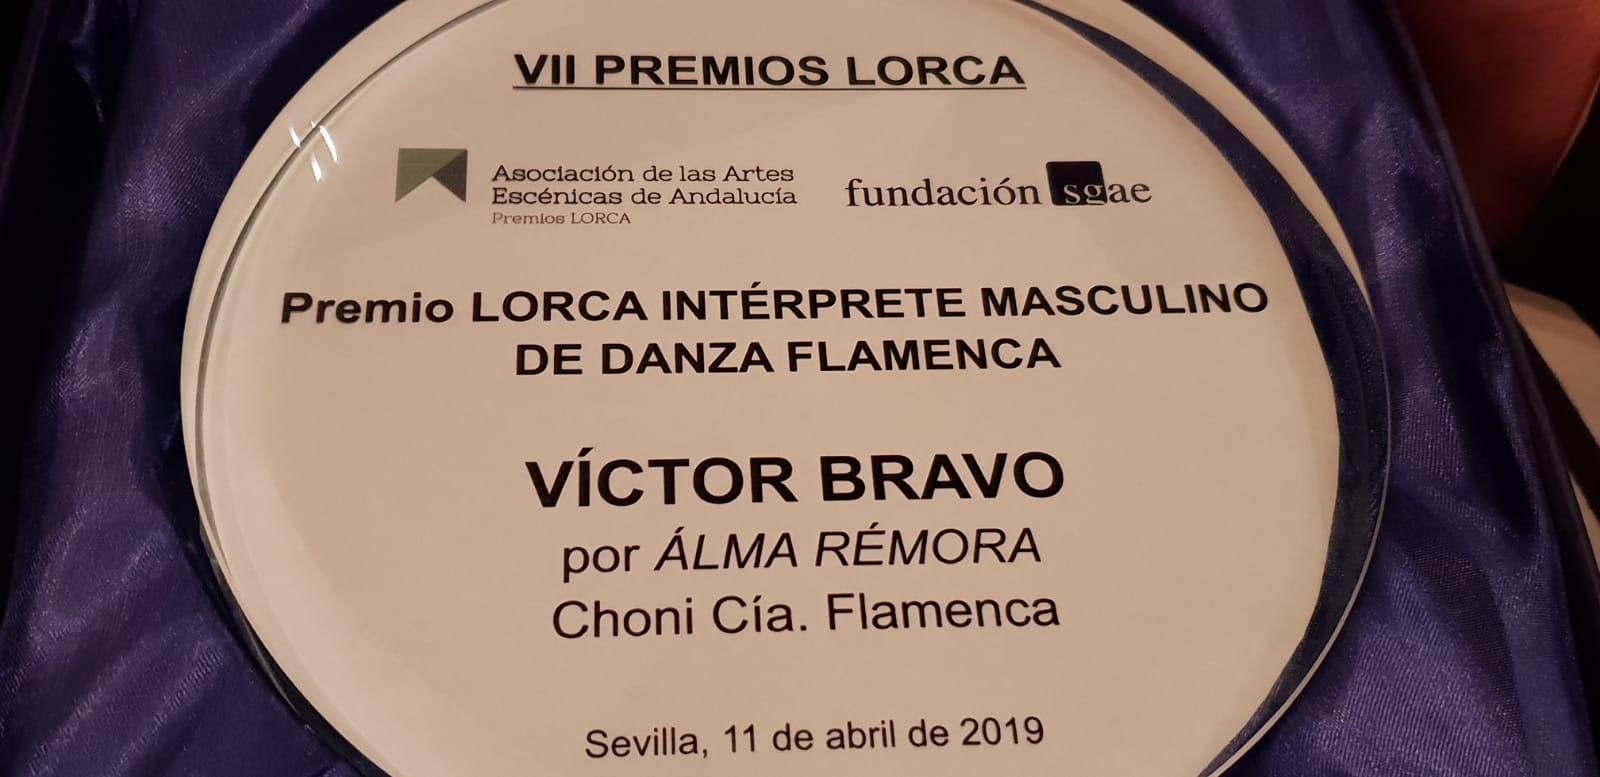 Premios Lorca VII Edición